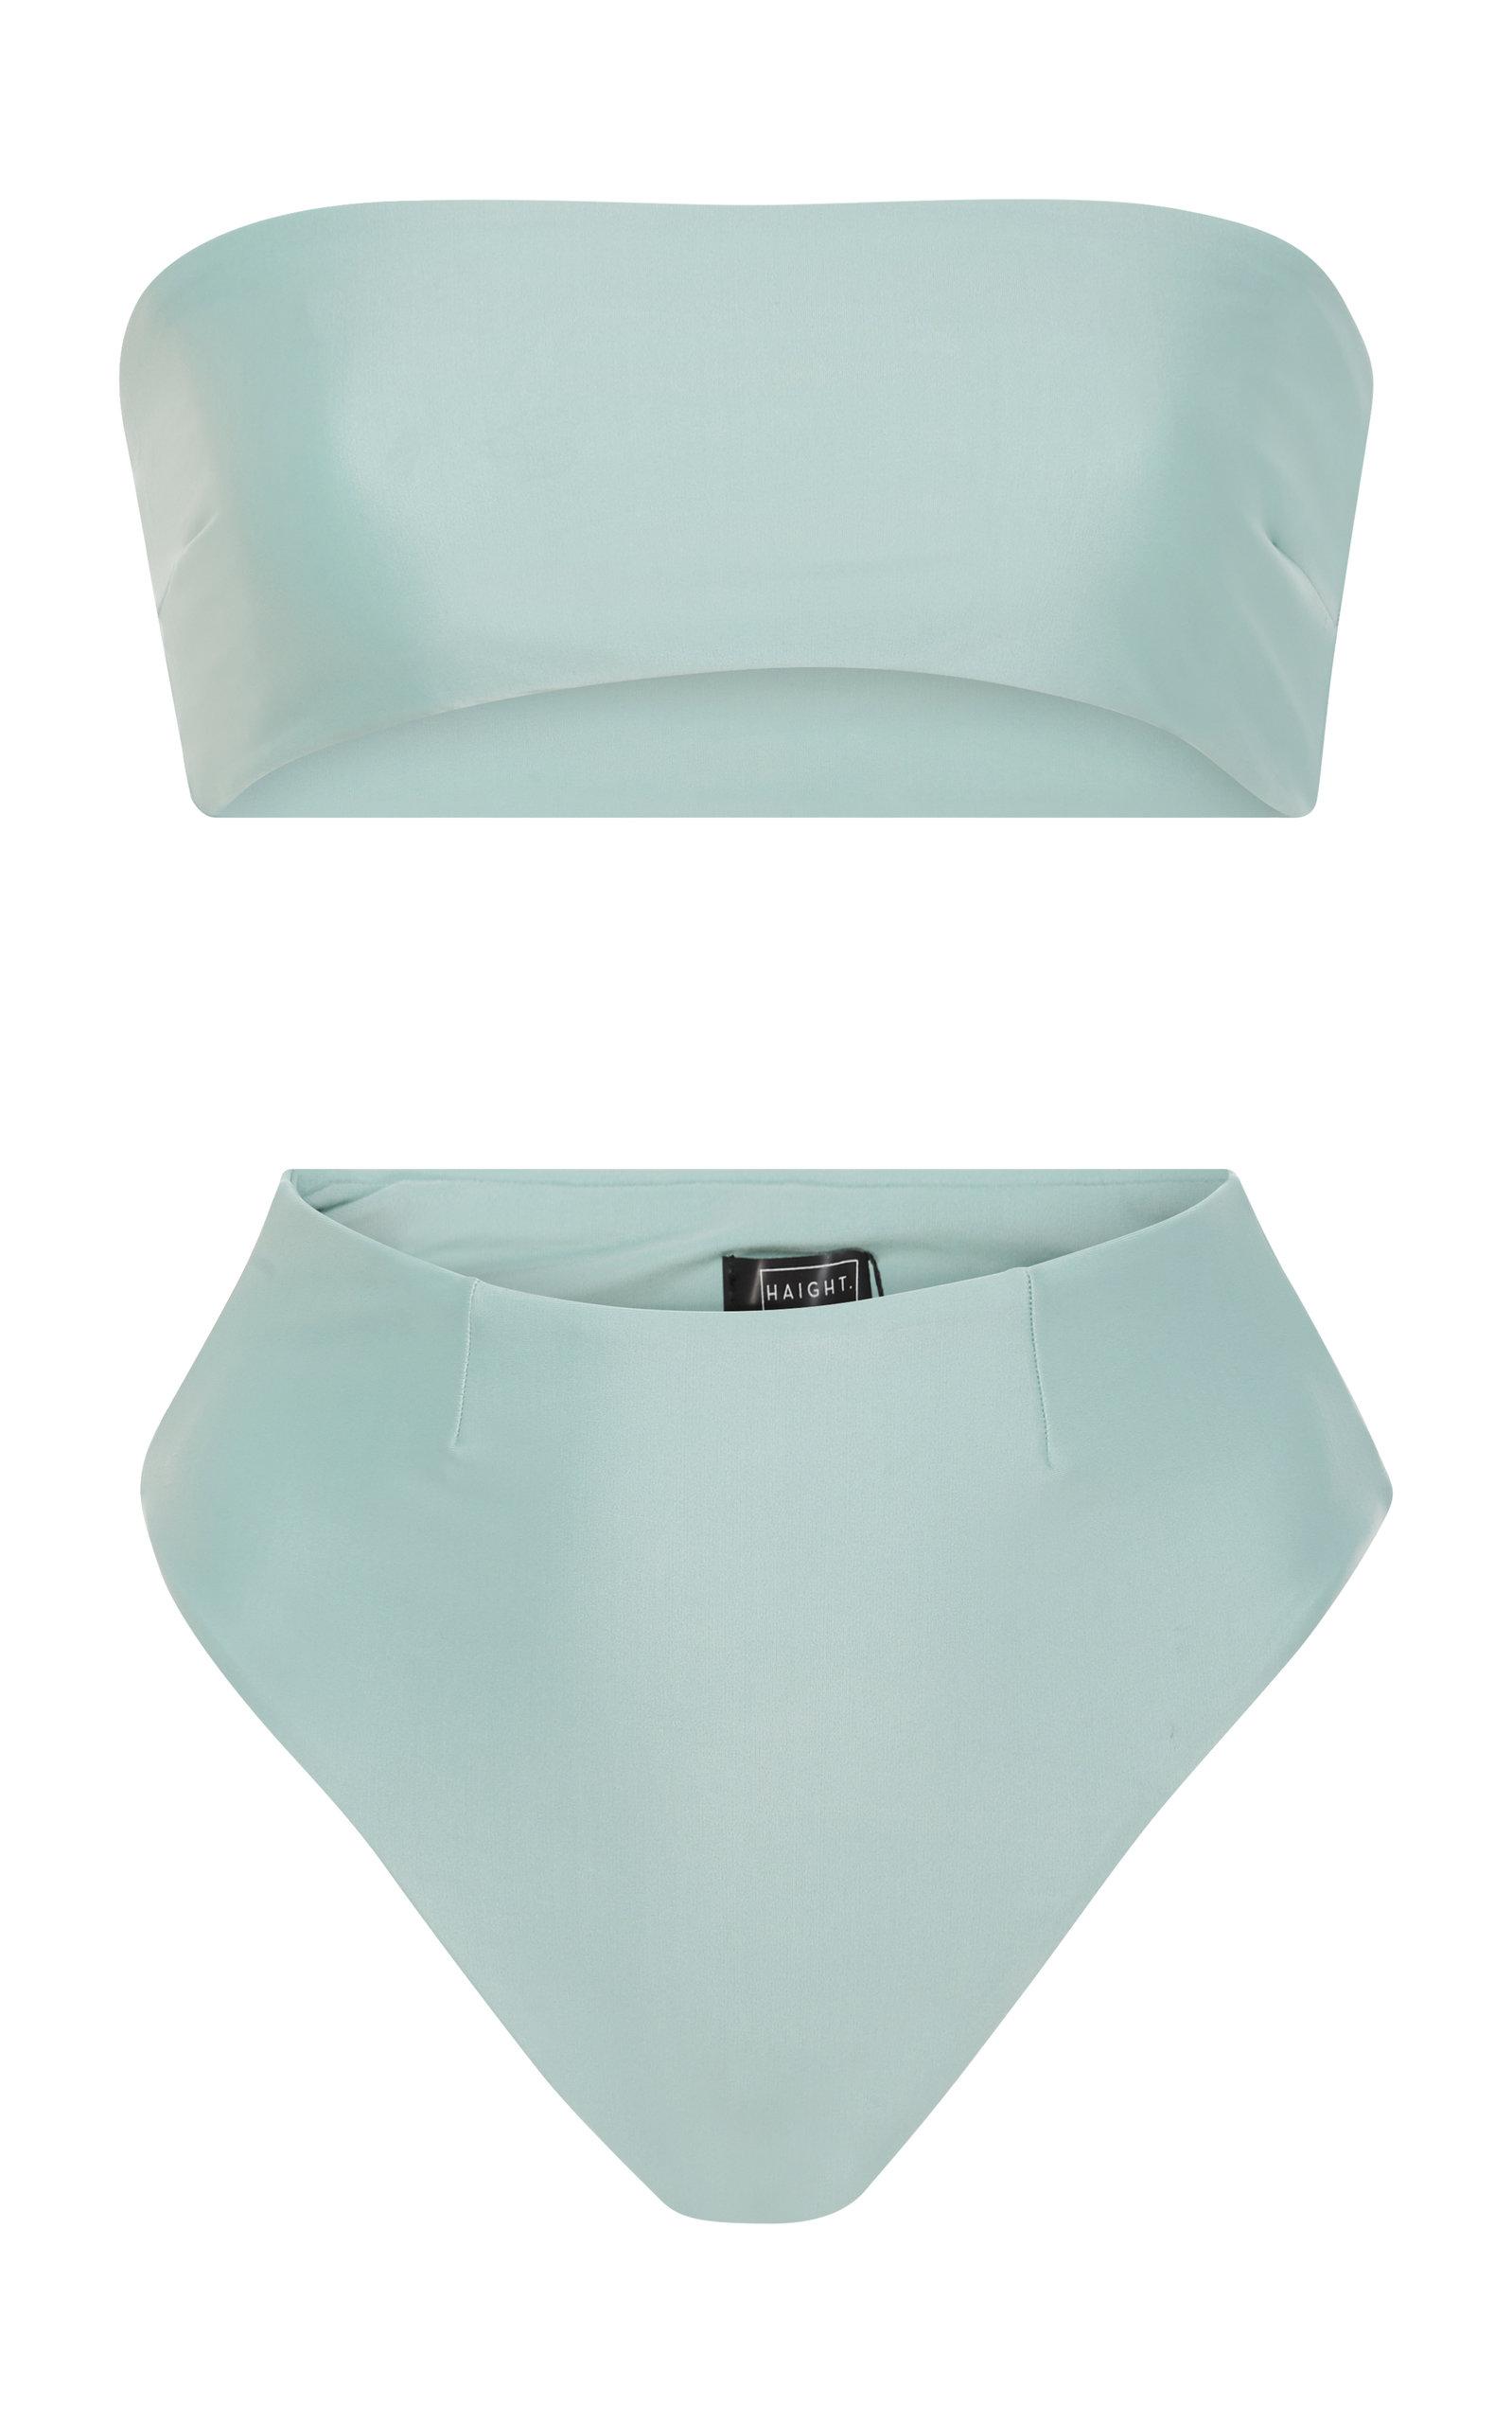 1e75c5e342 Marcella Basic Bikini Set by Haight | Moda Operandi